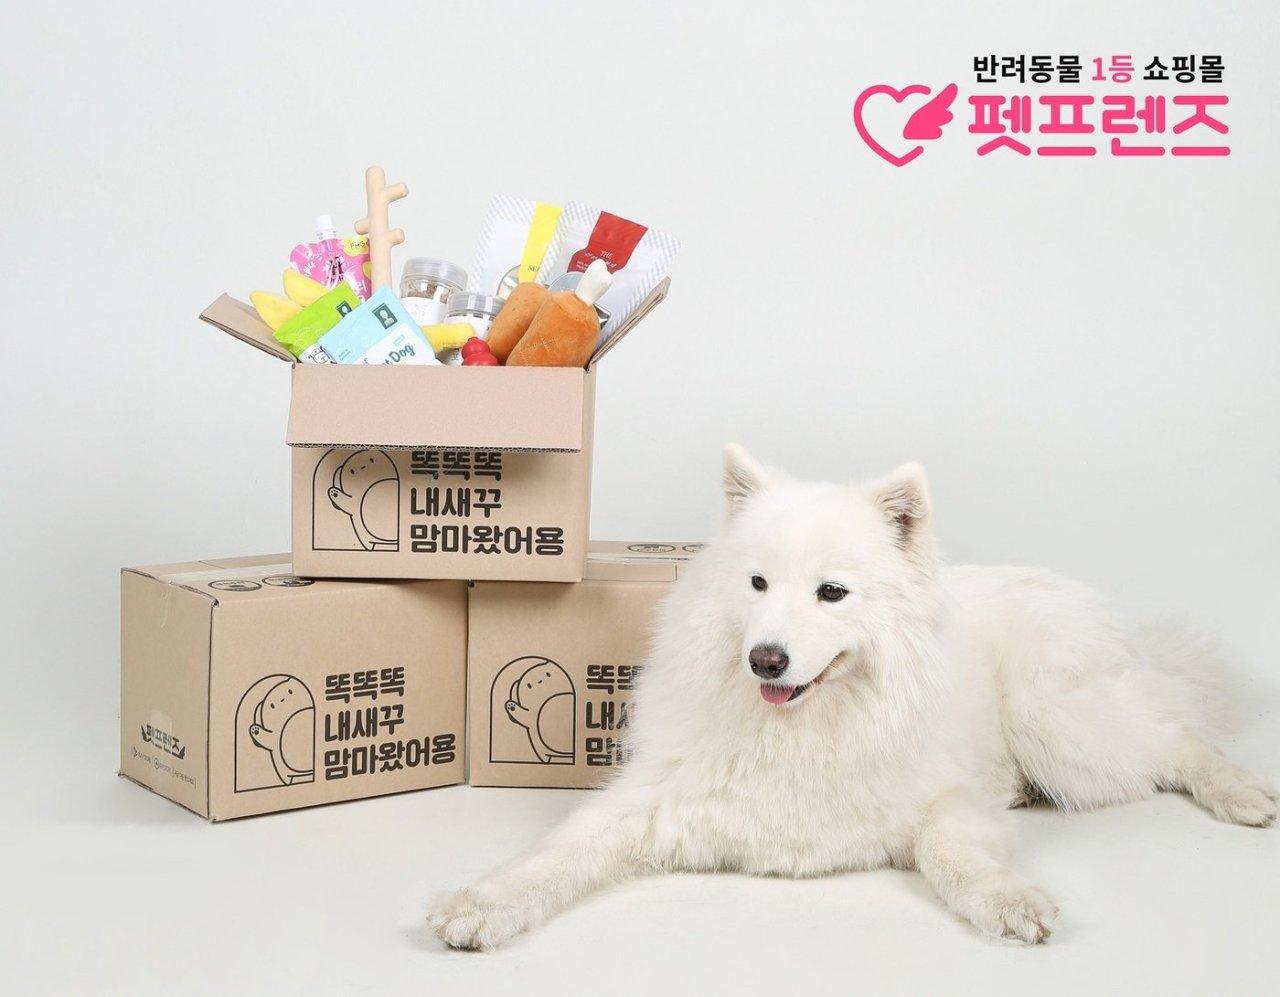 A promotional image of Pet Friends' pet care product delivery service (Pet Friends)